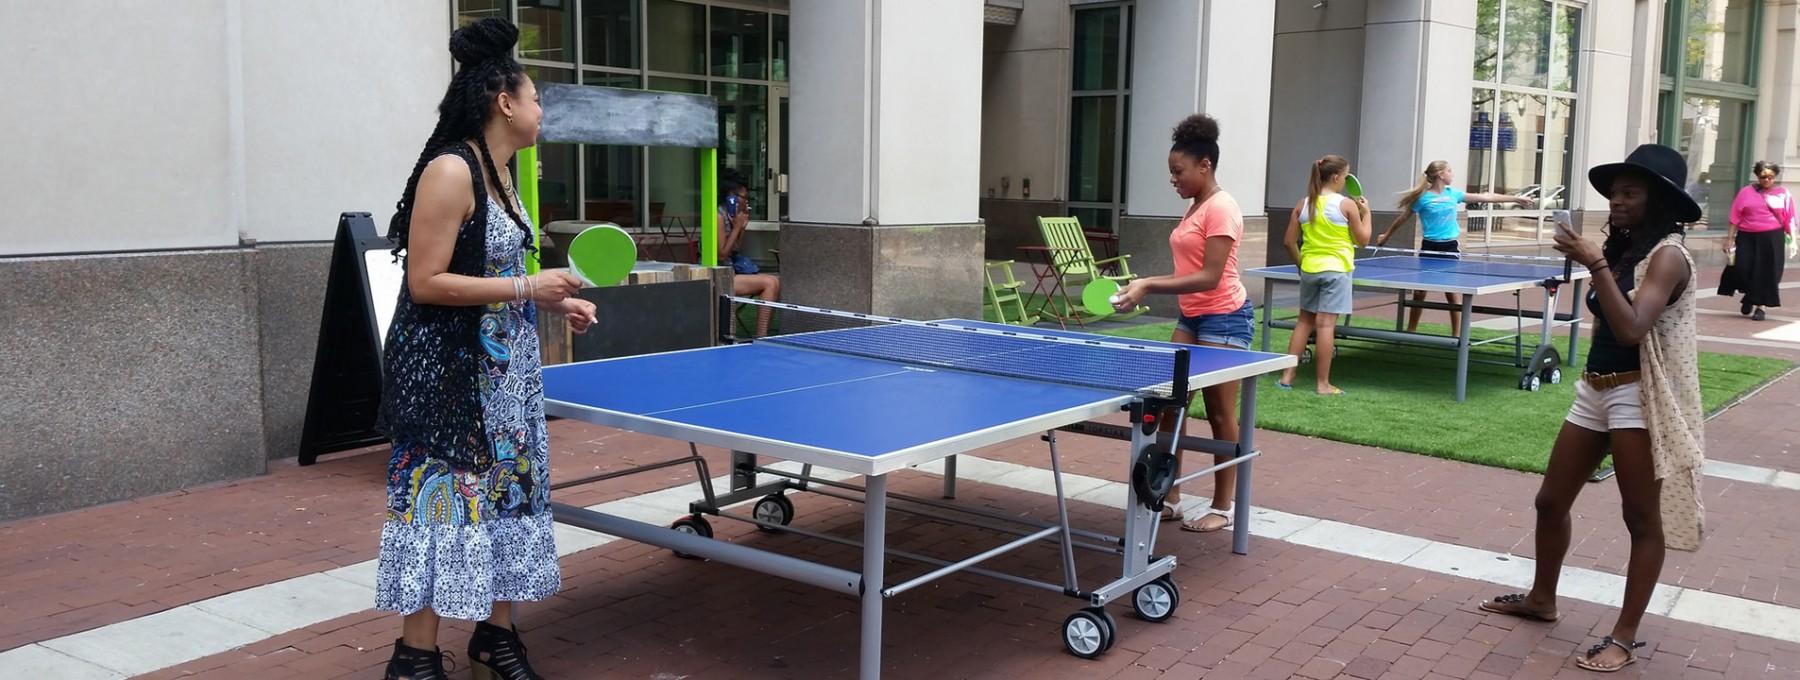 slider 4-ping pong